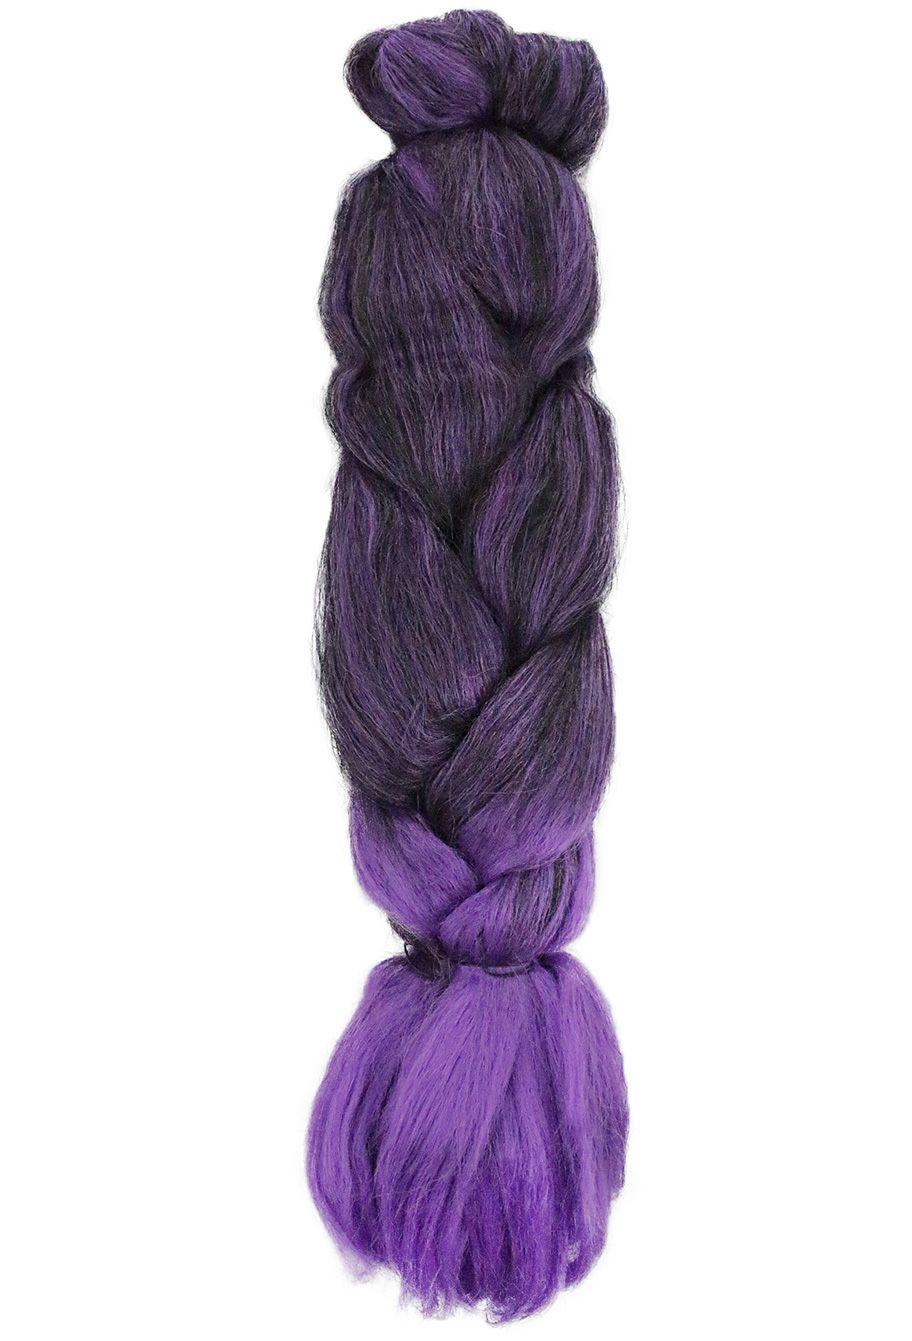 Cabelo Sintético - Ser Mulher - Jumbo (399g) - Cor: Preto com Roxo (T1B/Purple)